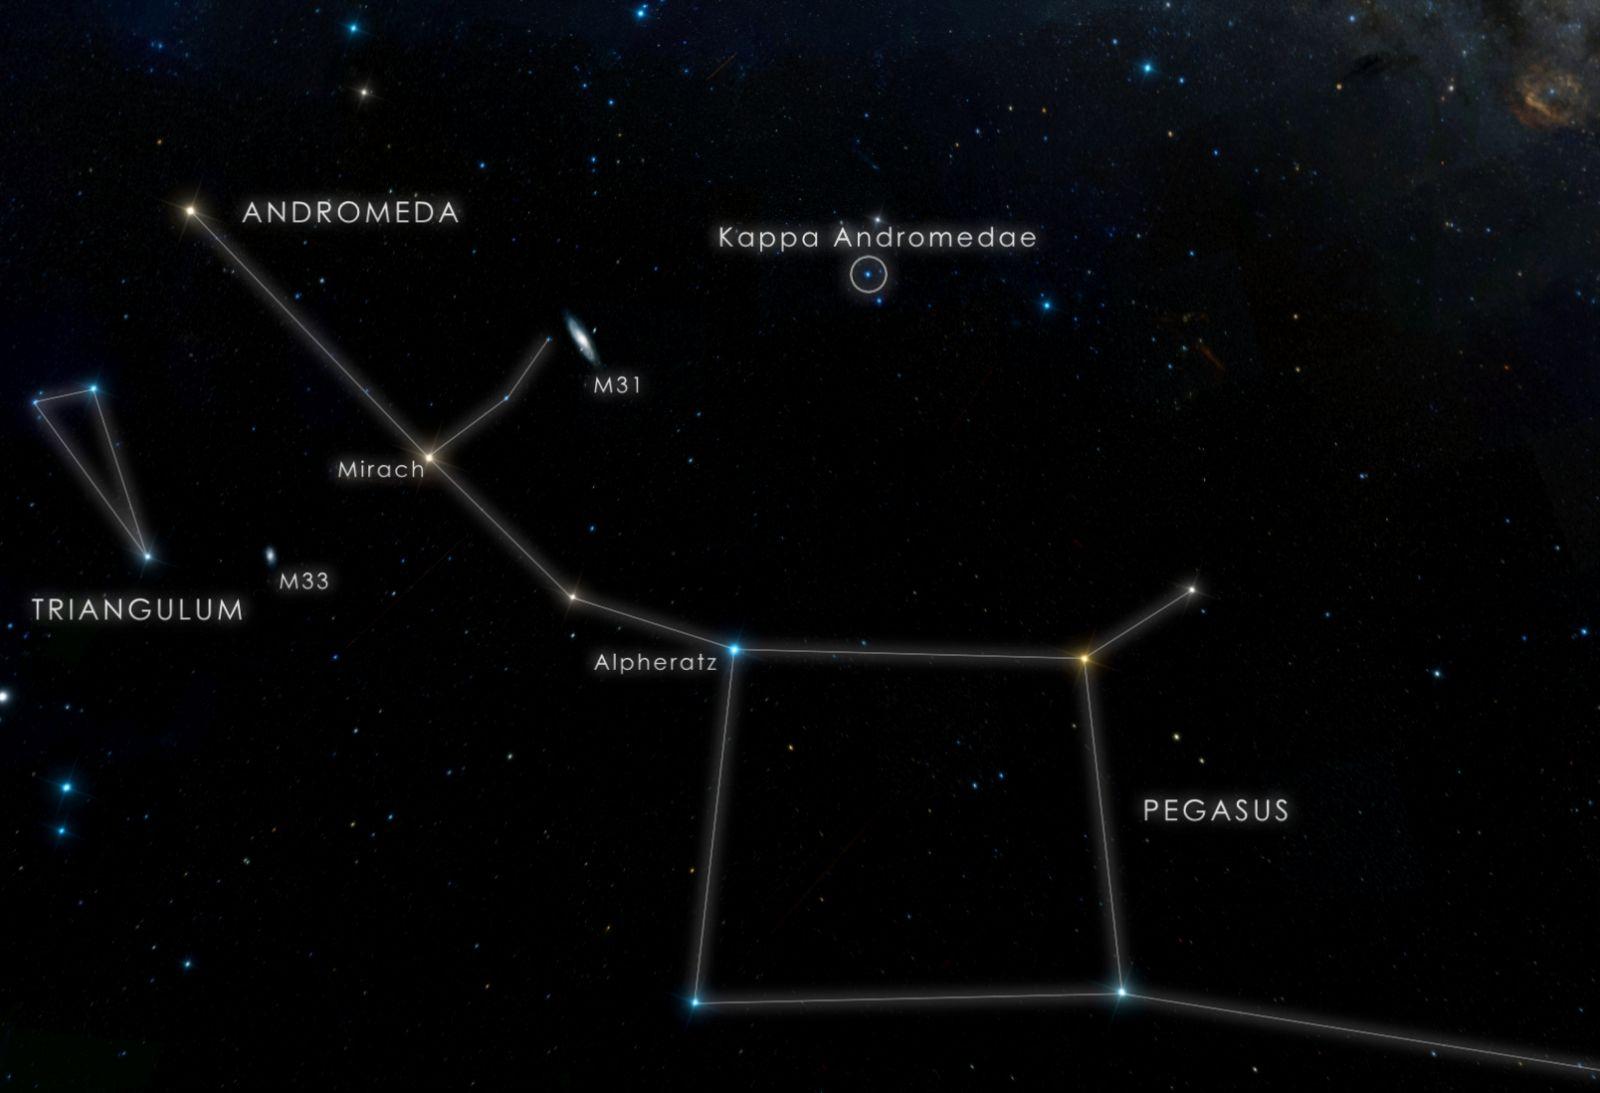 nasa galaxy chart - photo #29